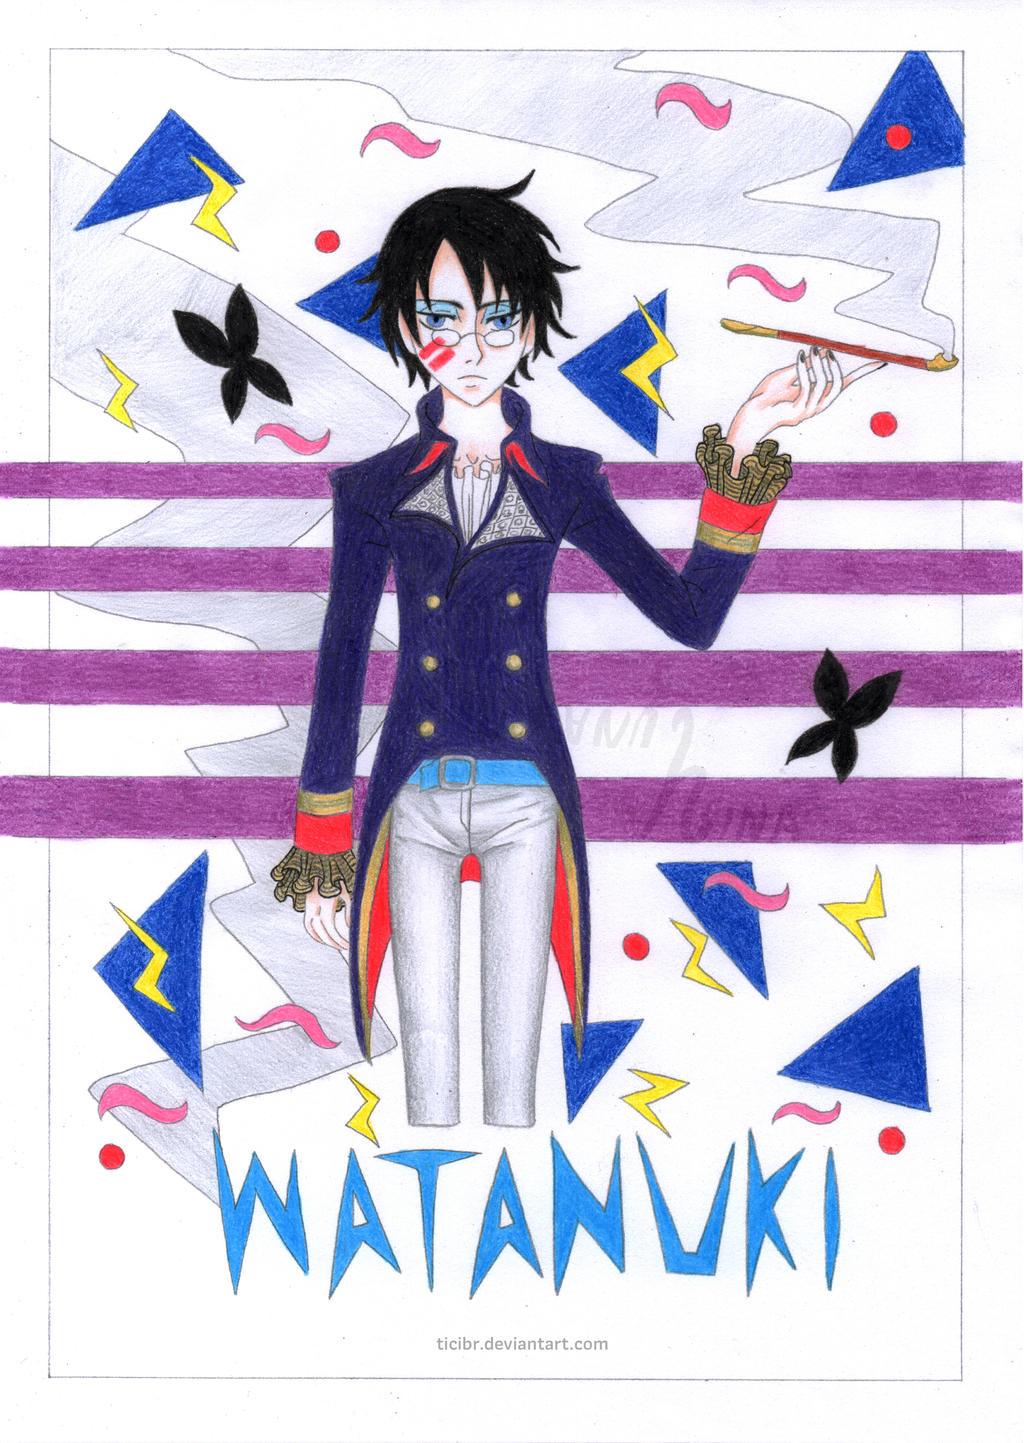 Watanuki - New Wave by ticibr